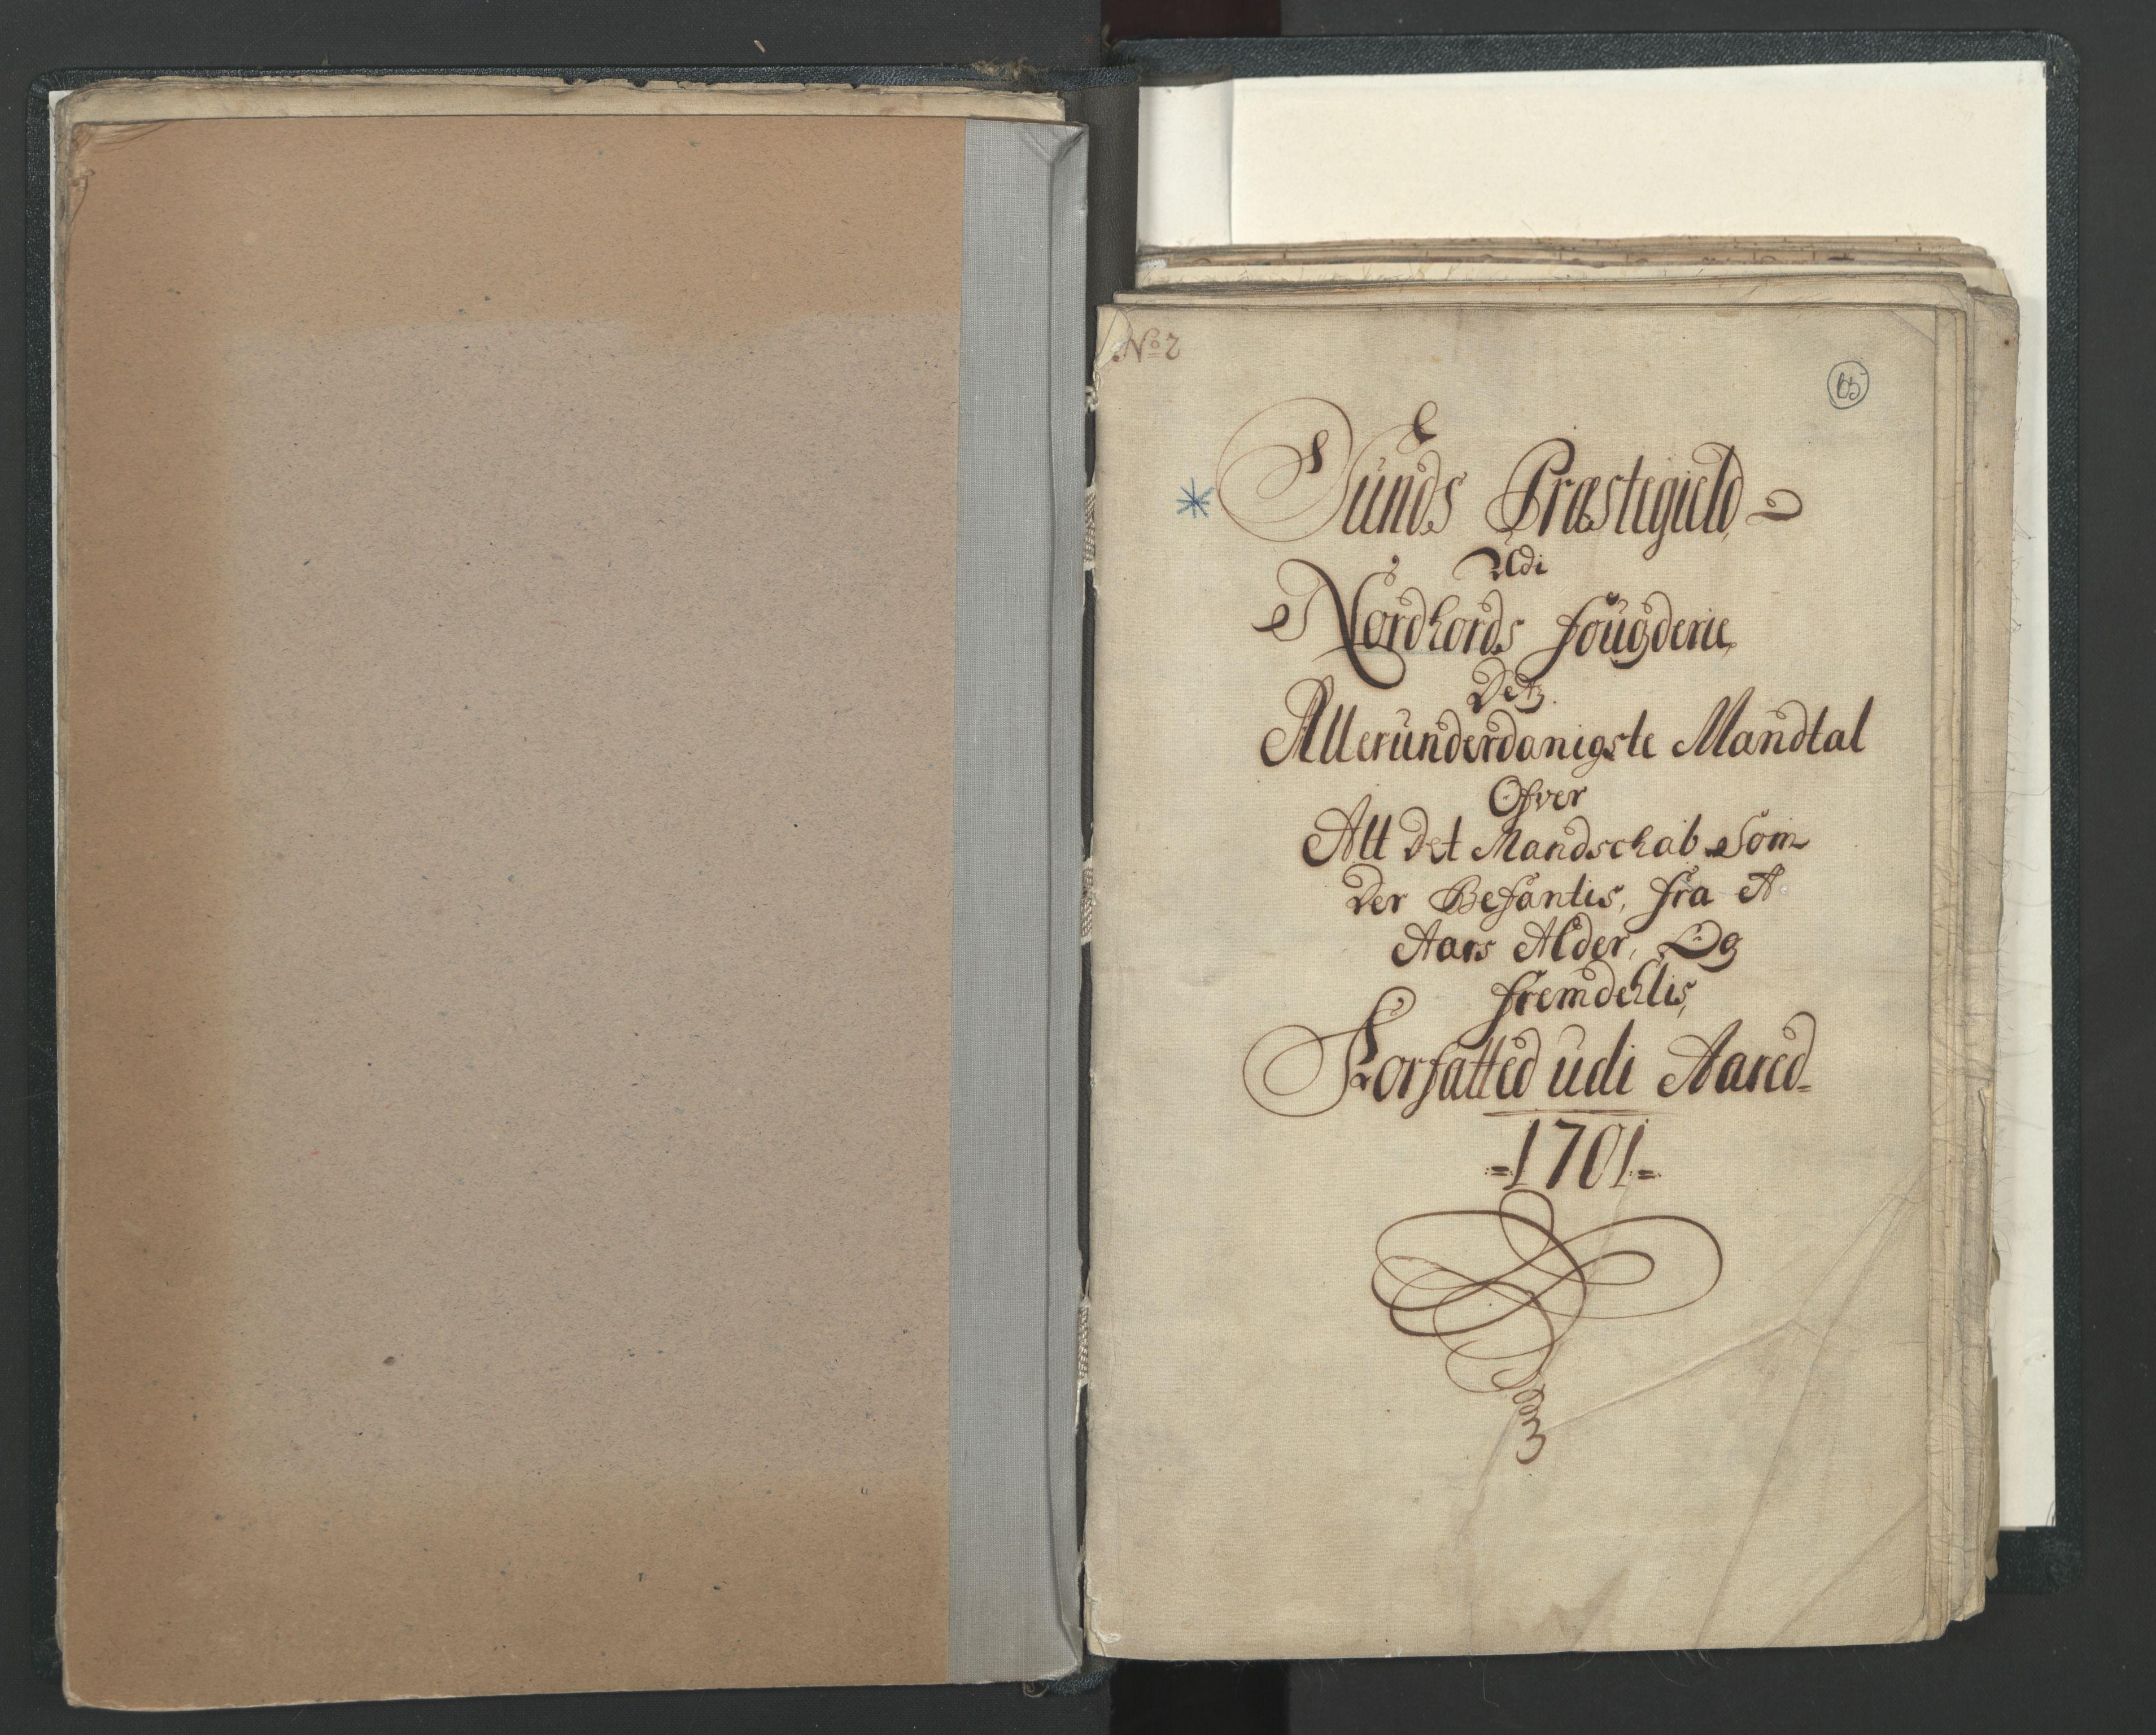 RA, Manntallet 1701, nr. 7: Nordhordland og Voss fogderi, 1701, s. 65